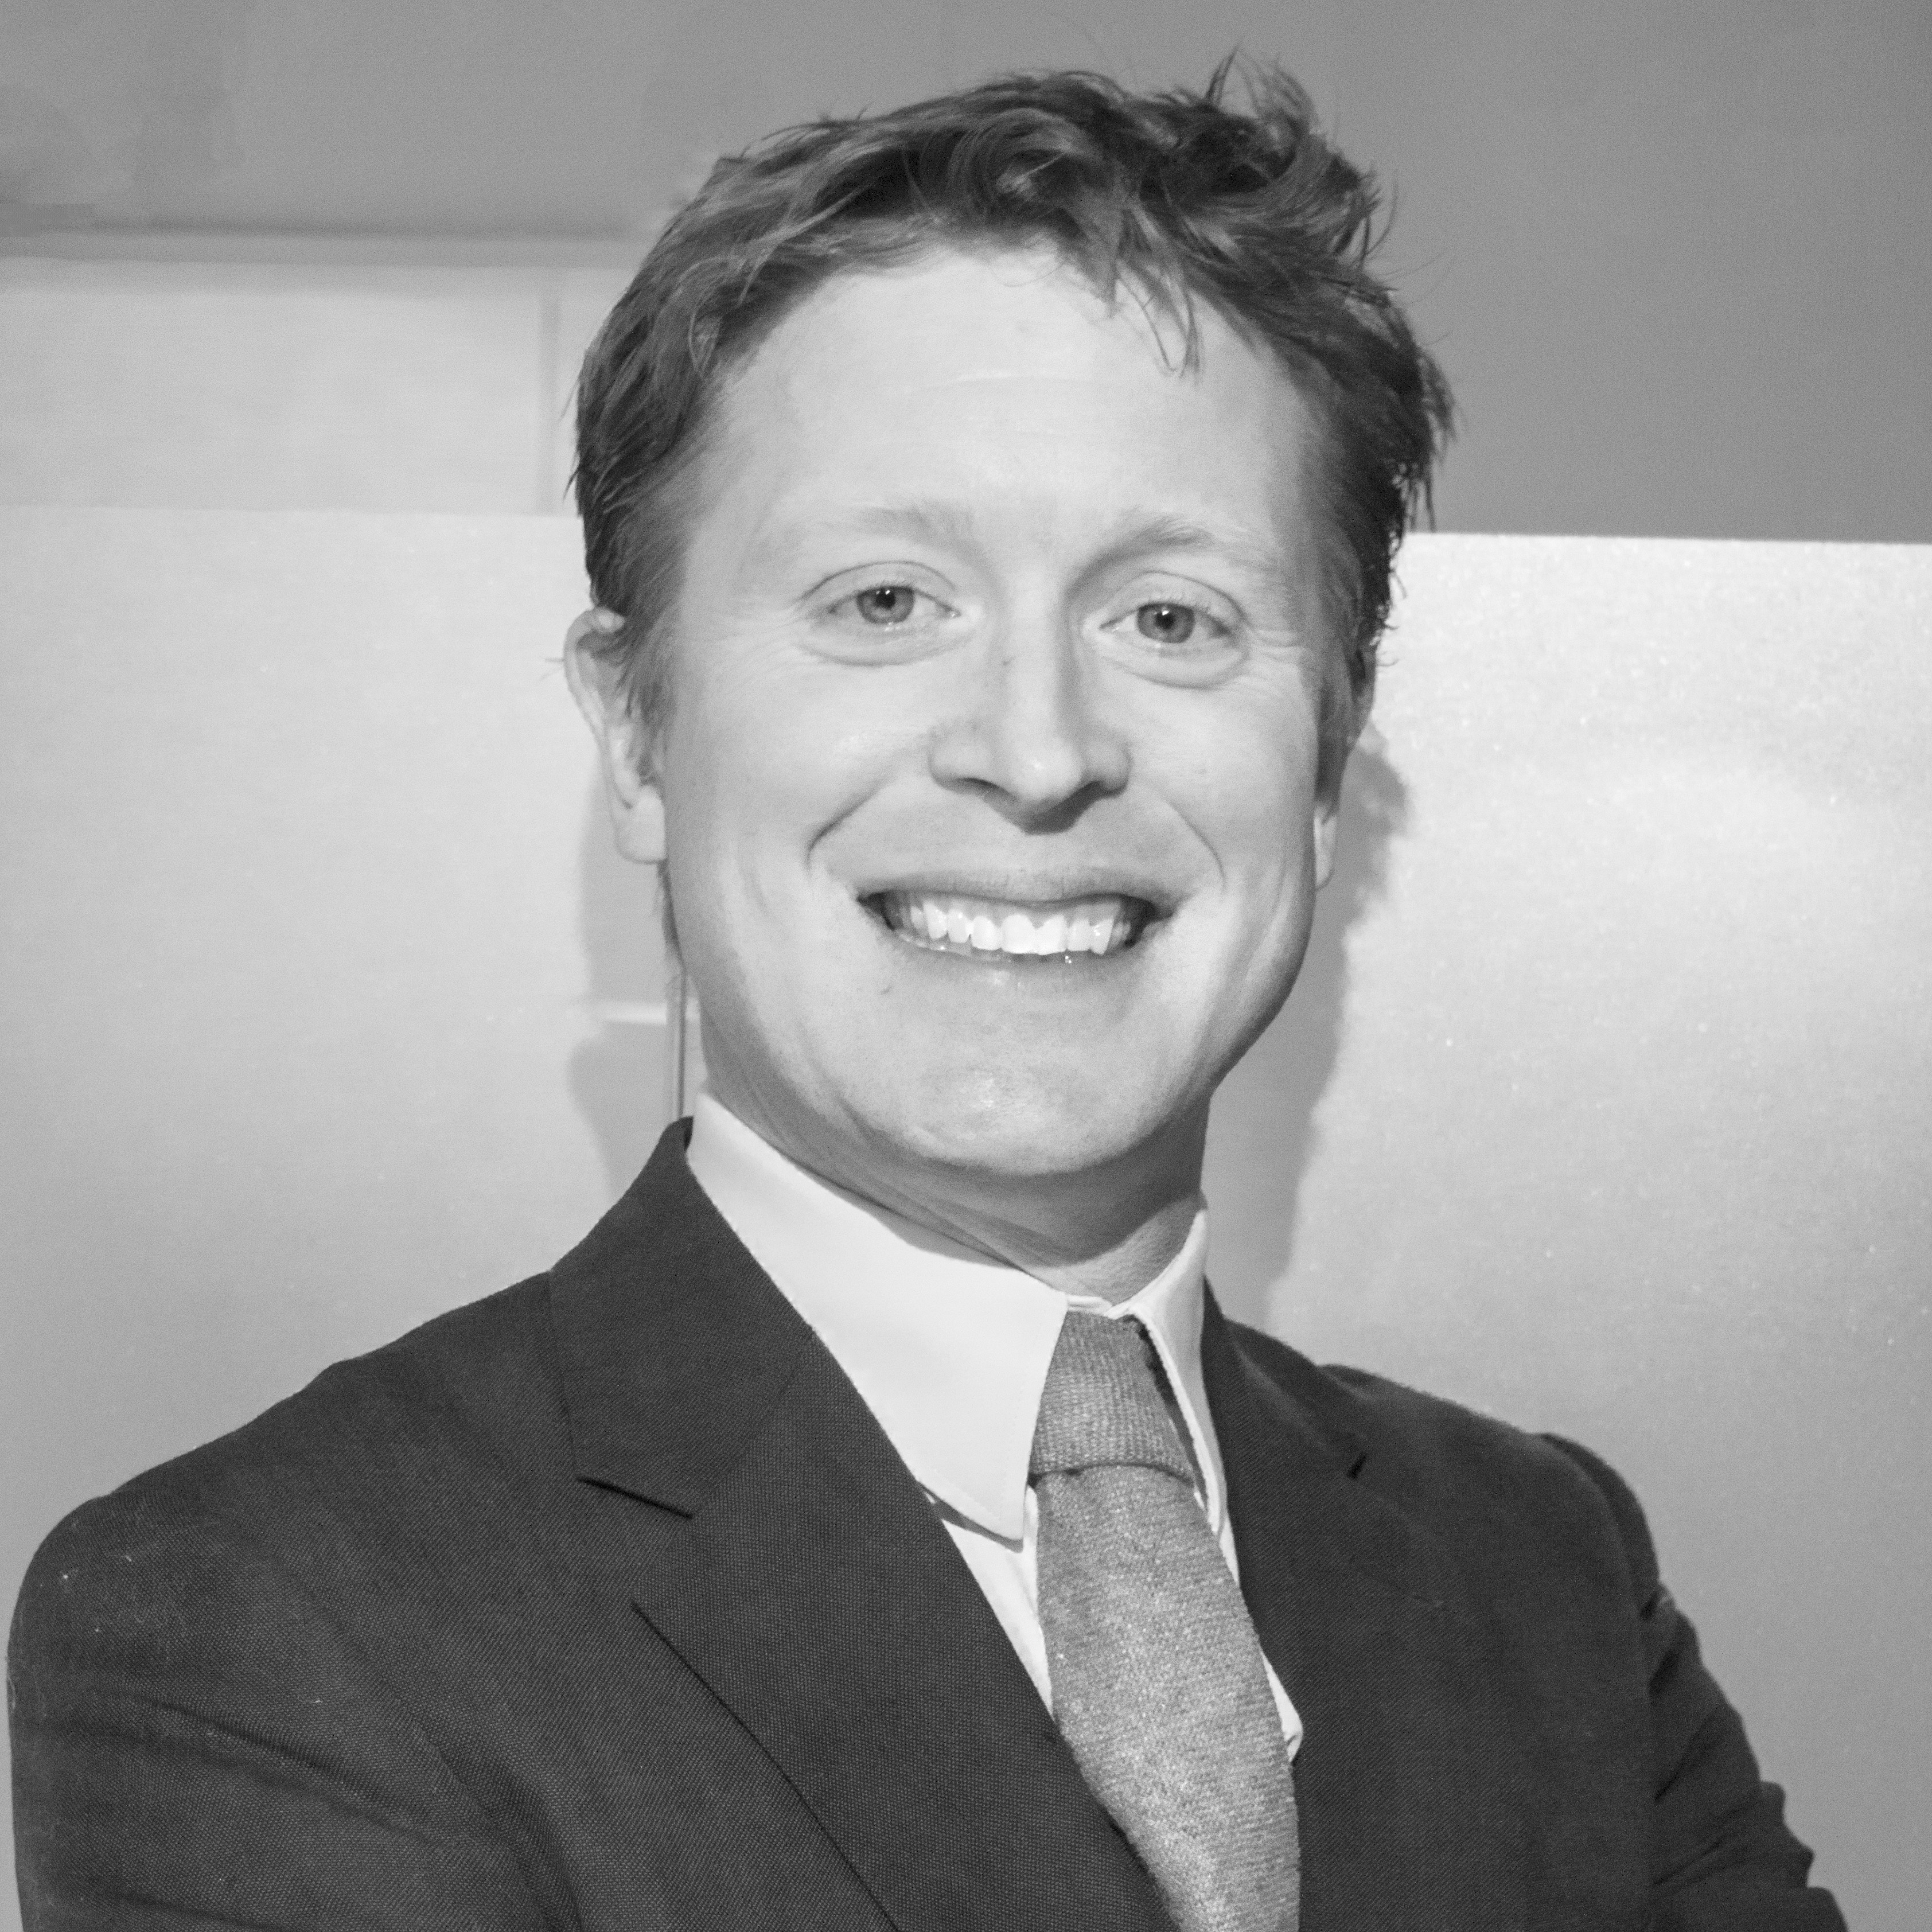 Carl Johan Hamilton